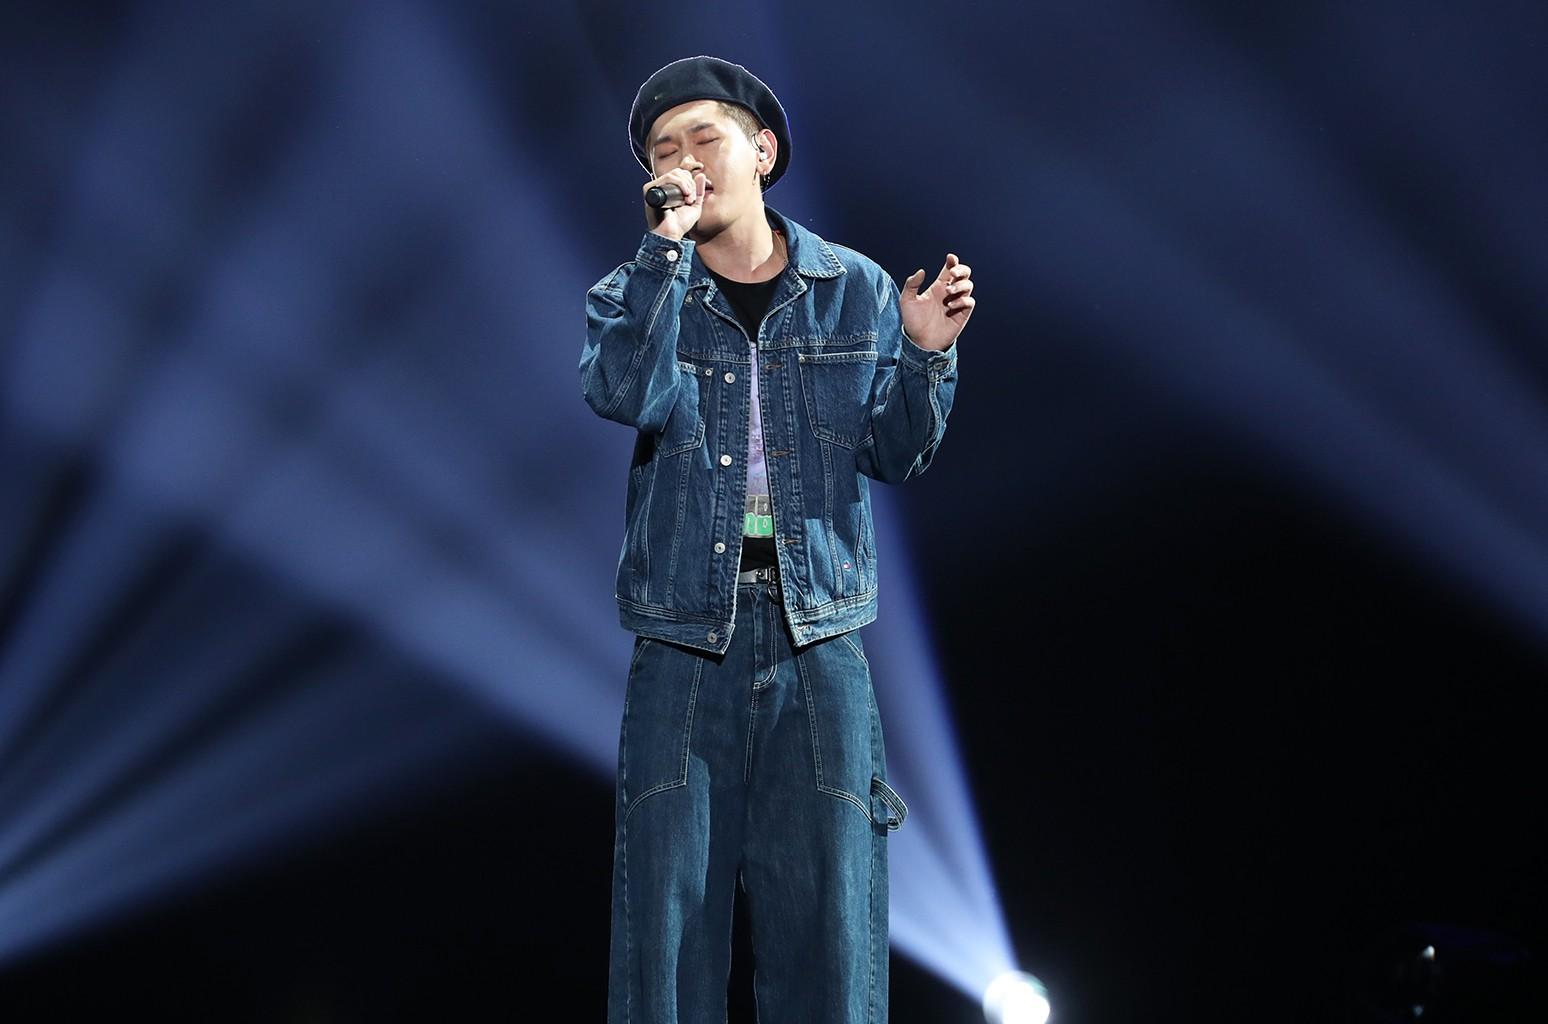 Crush performs at KCON 2016